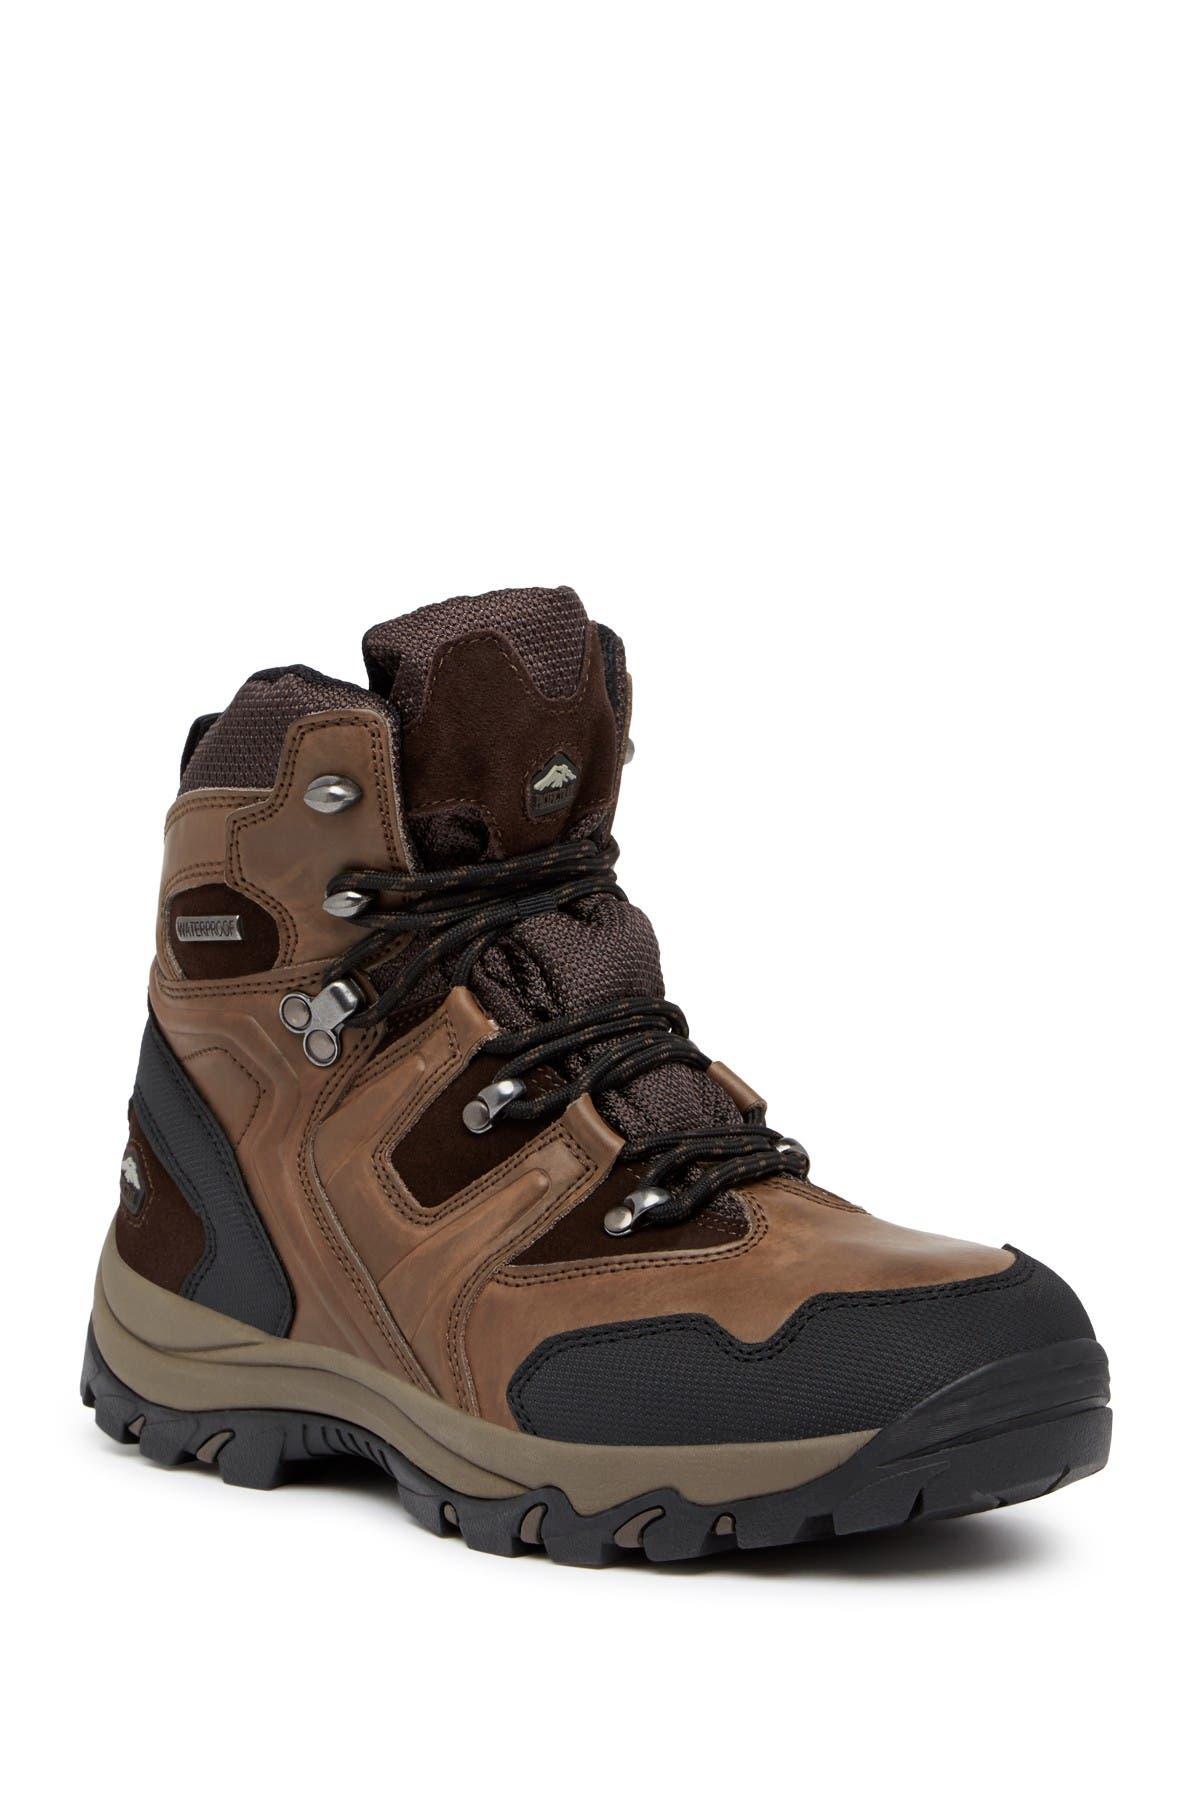 Pacific Trail Mens Denali Hiking Boot